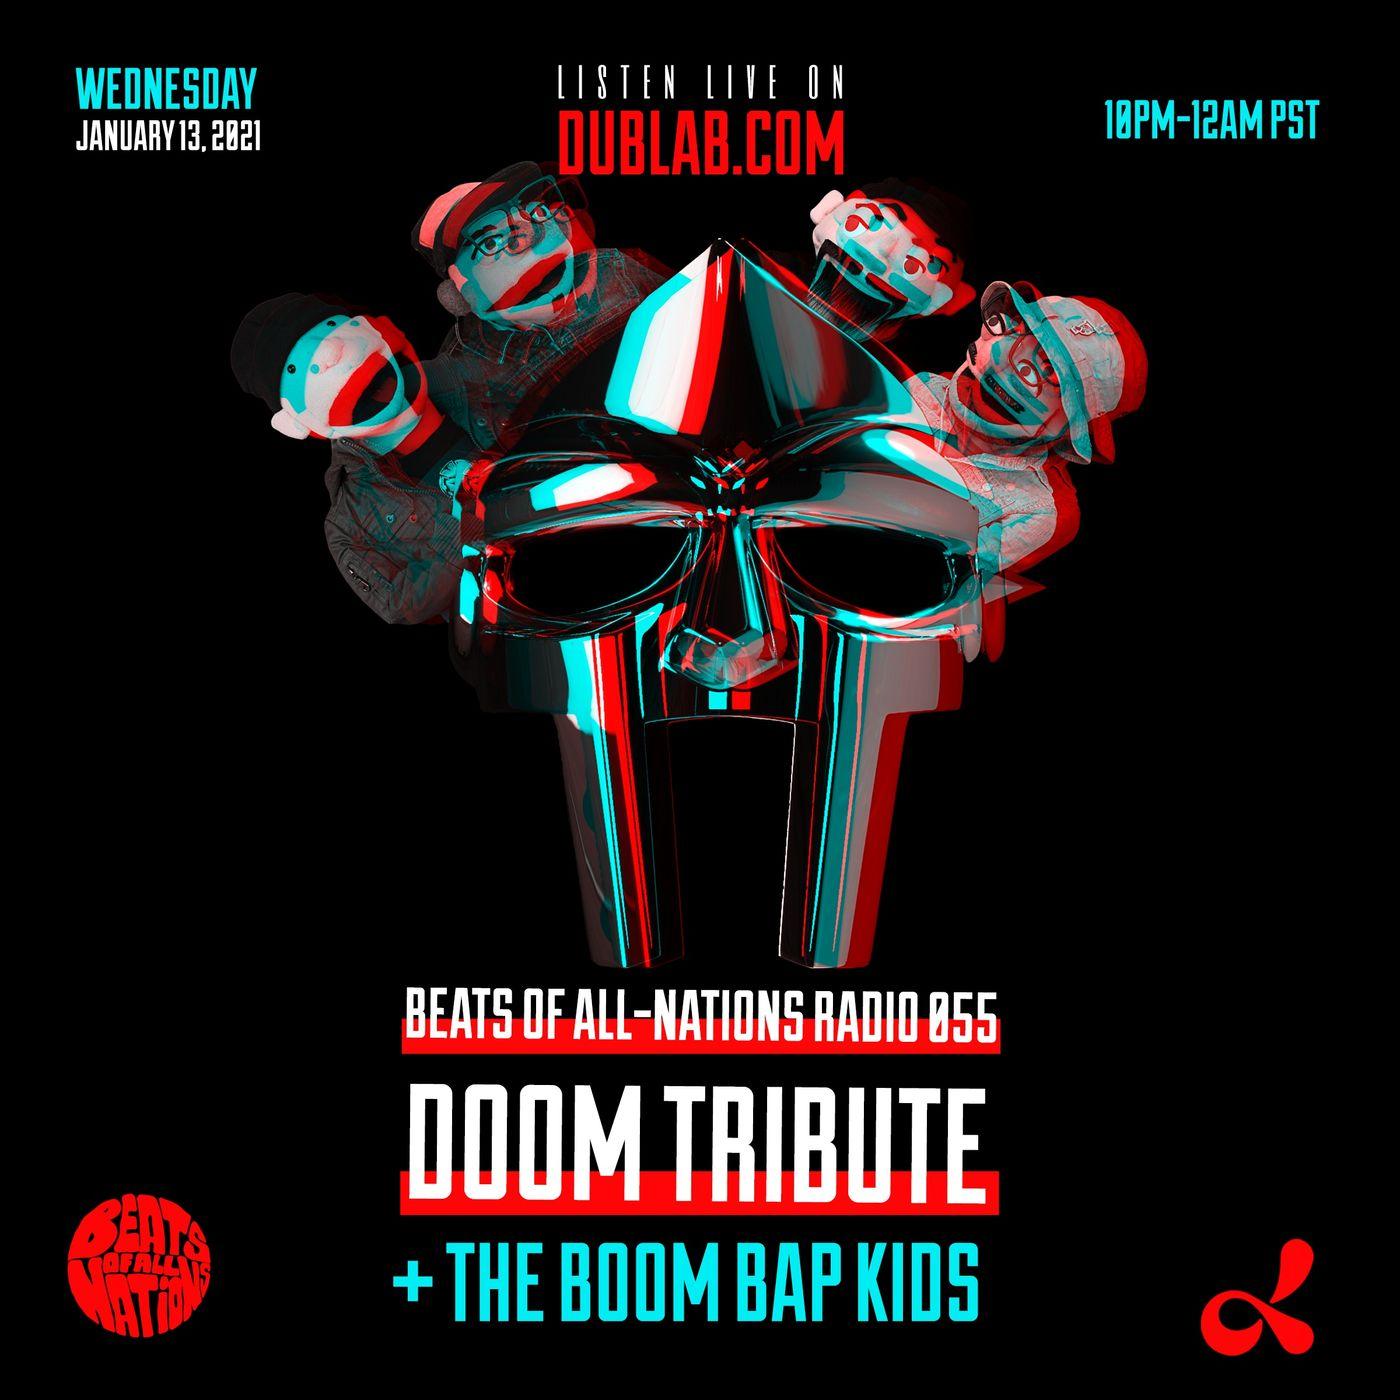 MF DOOM Tribute + The Boom Bap Kids | Beats of All-Nations Radio 055 on Dublab